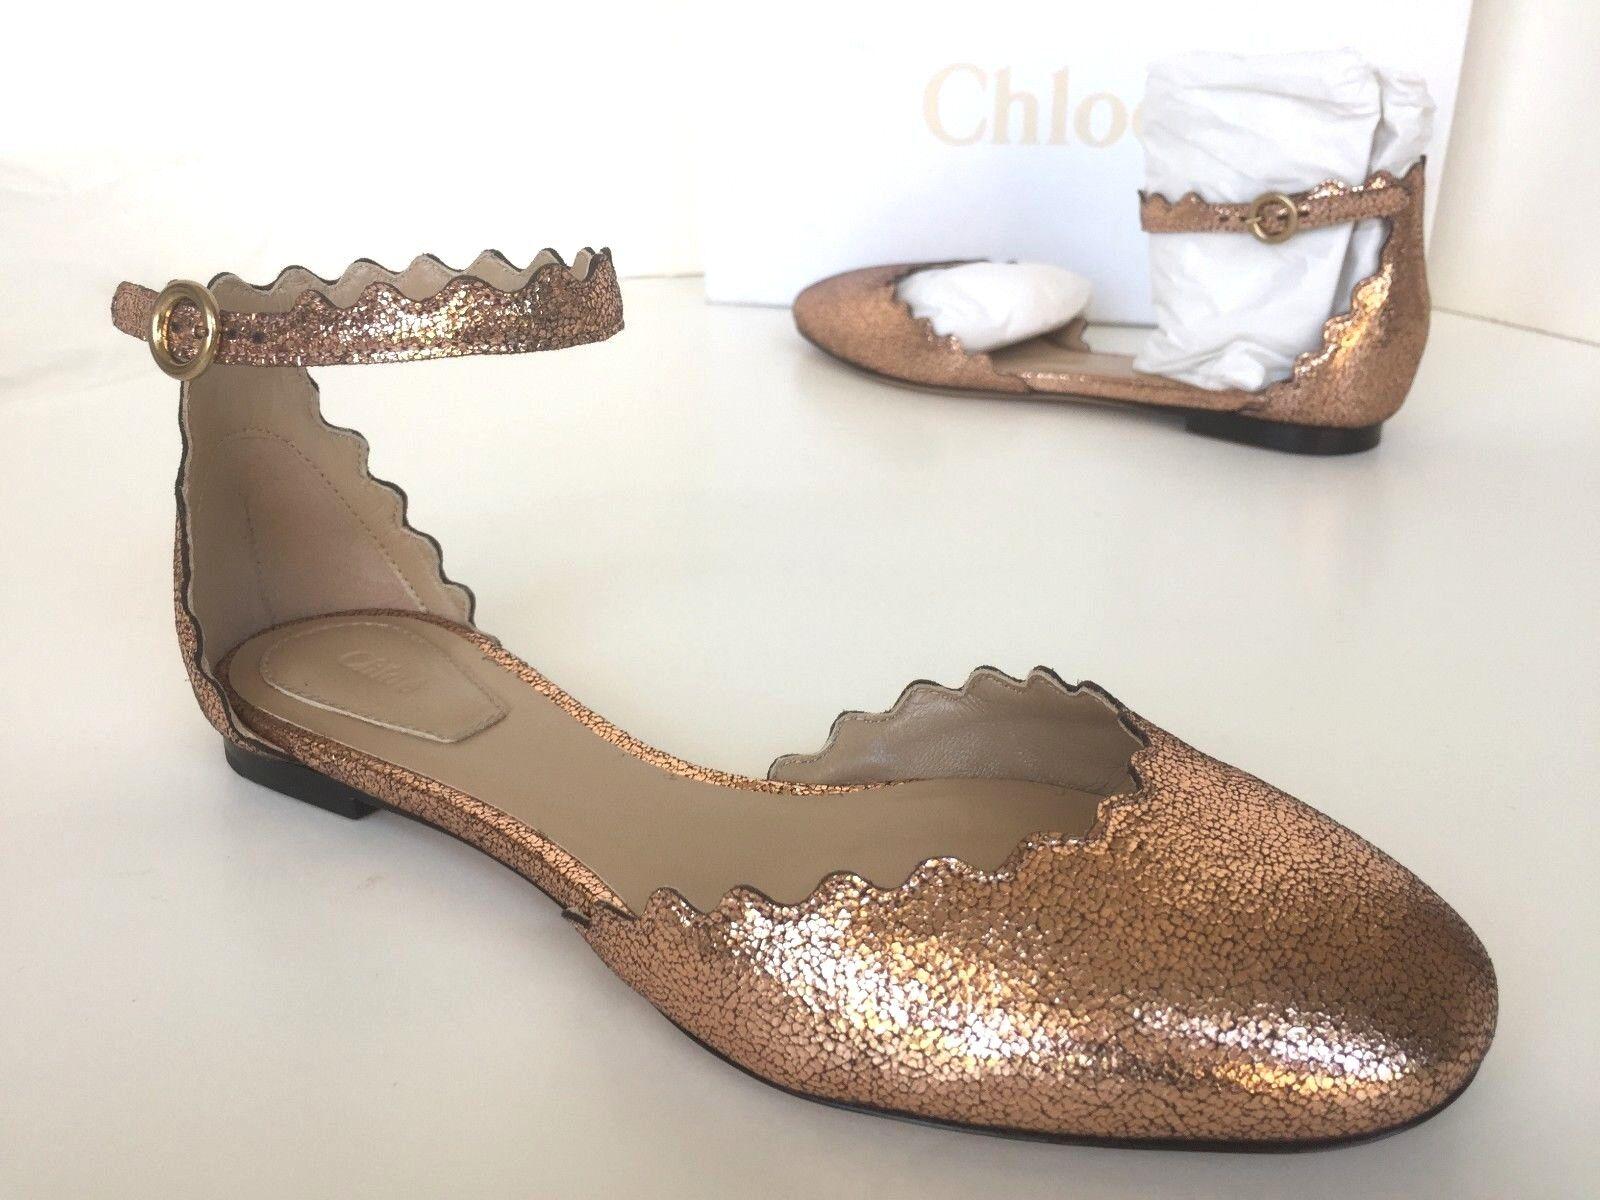 590 Chloe Lauren Scalloped Ballerina Ankle Strap Ballet Flat shoes Pink gold 34